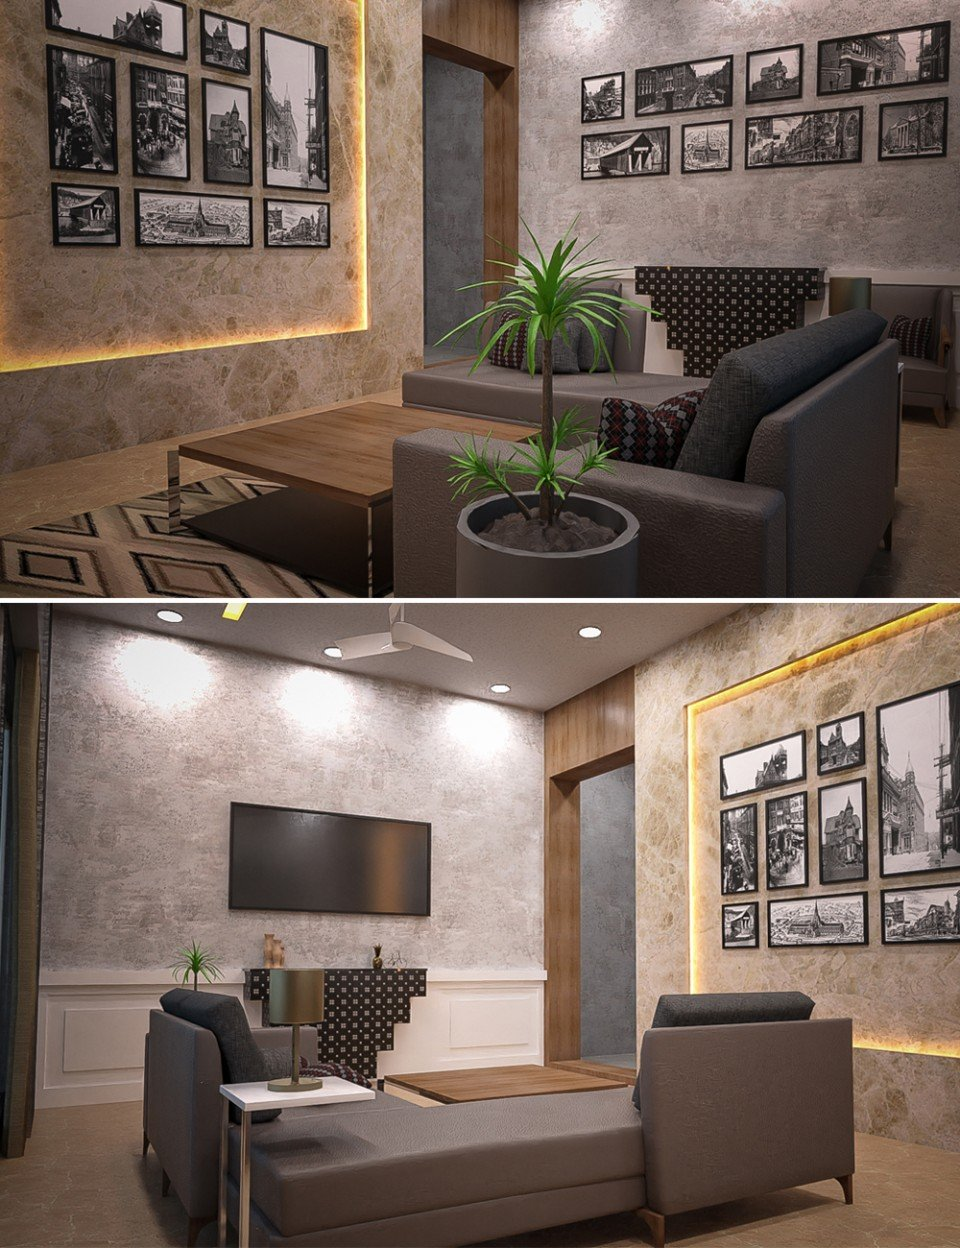 Neat Living Room_DAZ3D下载站